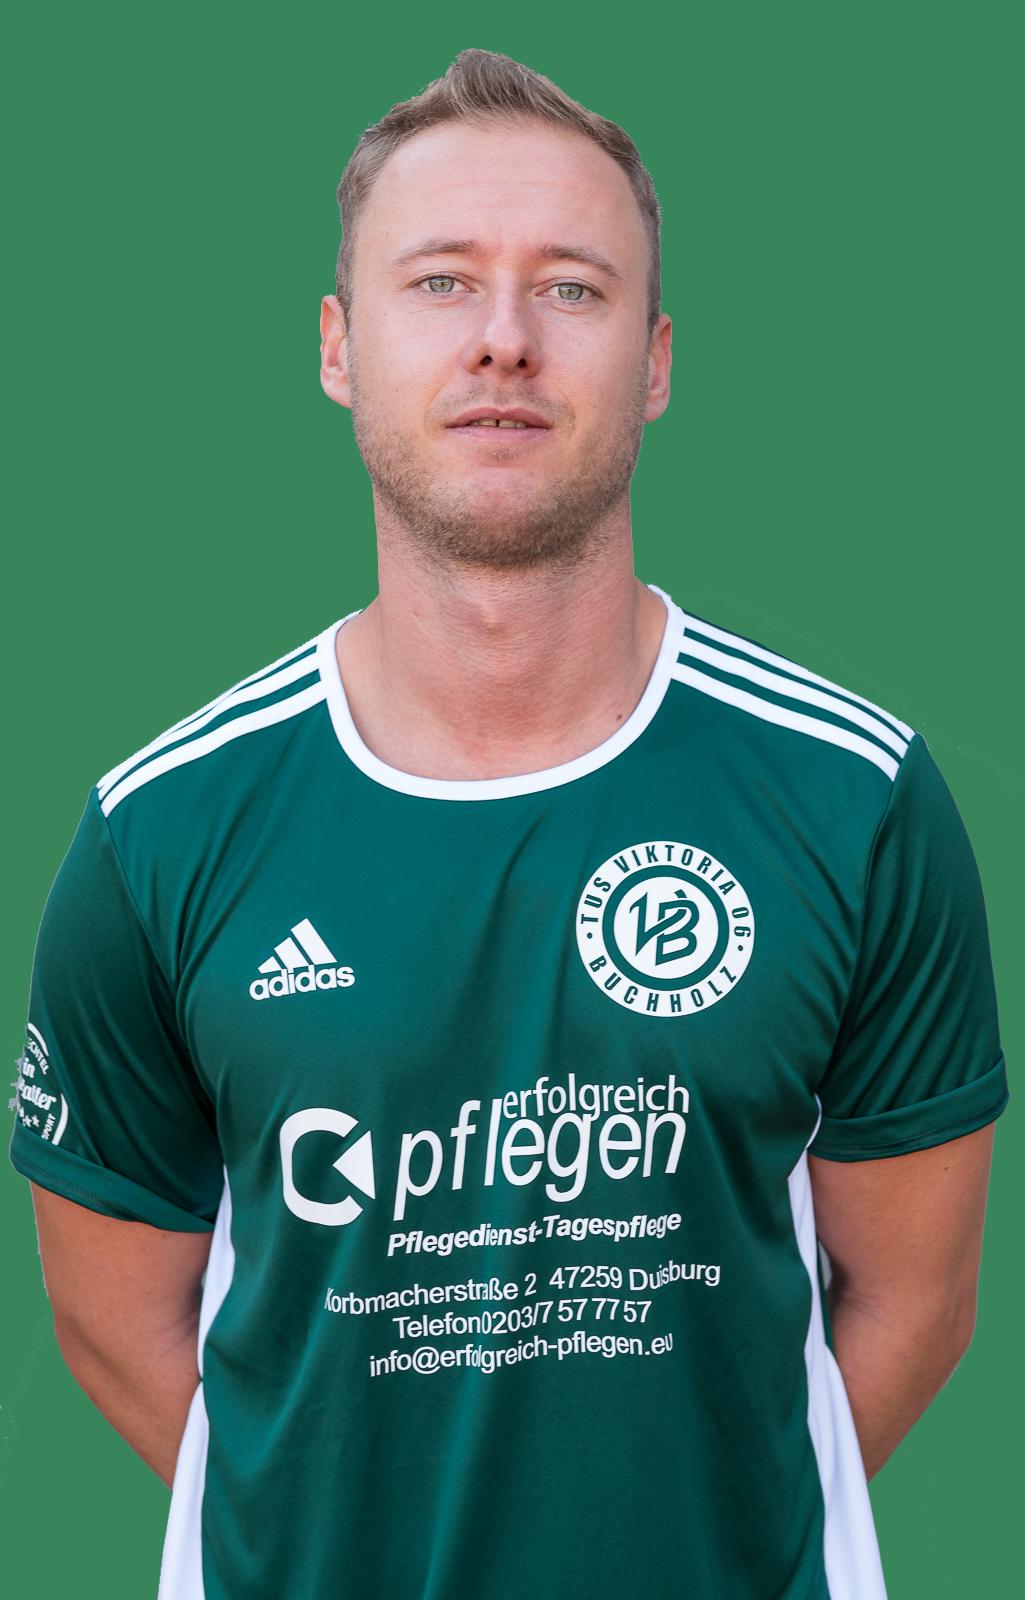 Marco Bruckmann